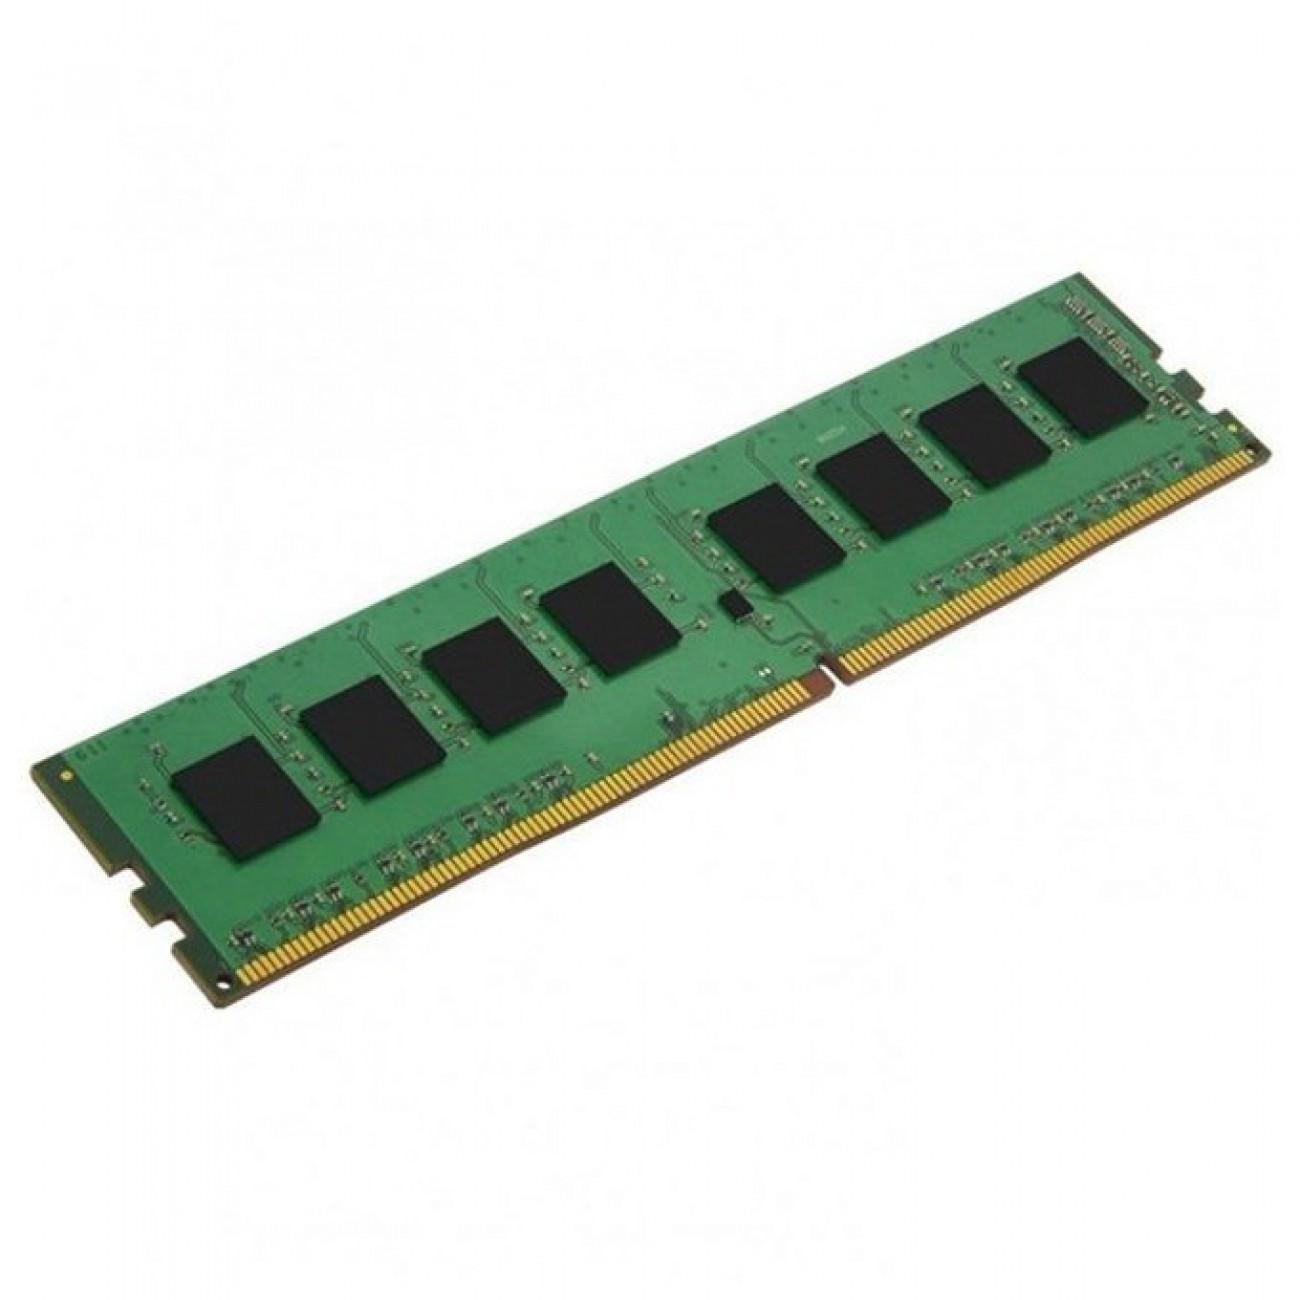 16GB DDR4 2666MHz, Kingston KVR26N19D8/16, 1.2 V в Настолни компютри Памети -  | Alleop